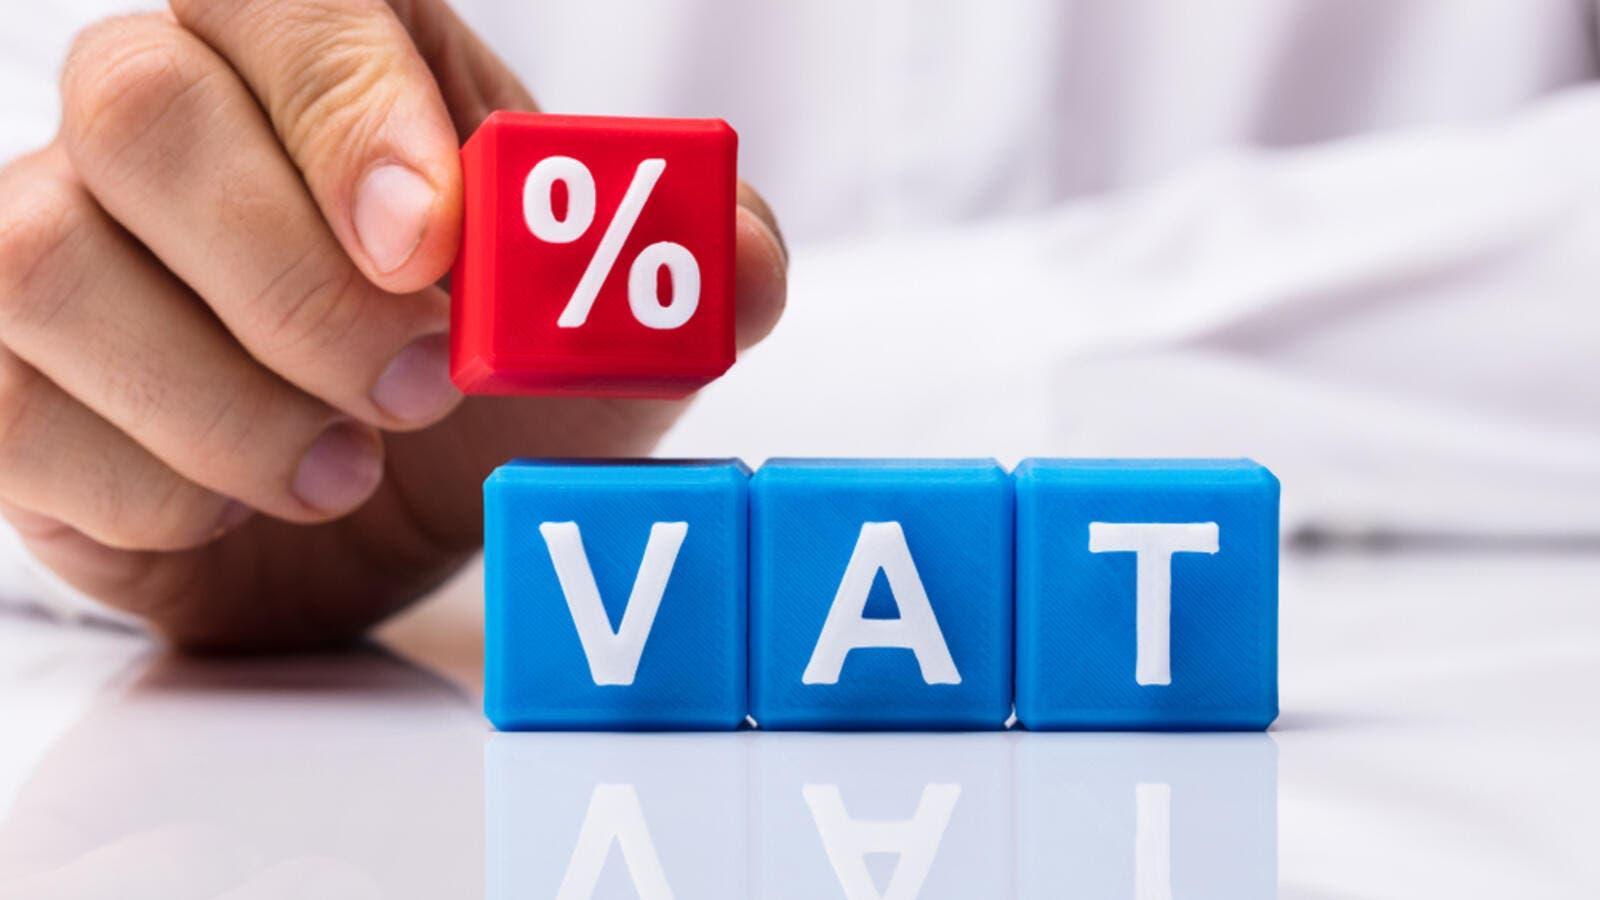 VAT-shutterstock-dec24.jpg (1600×900)